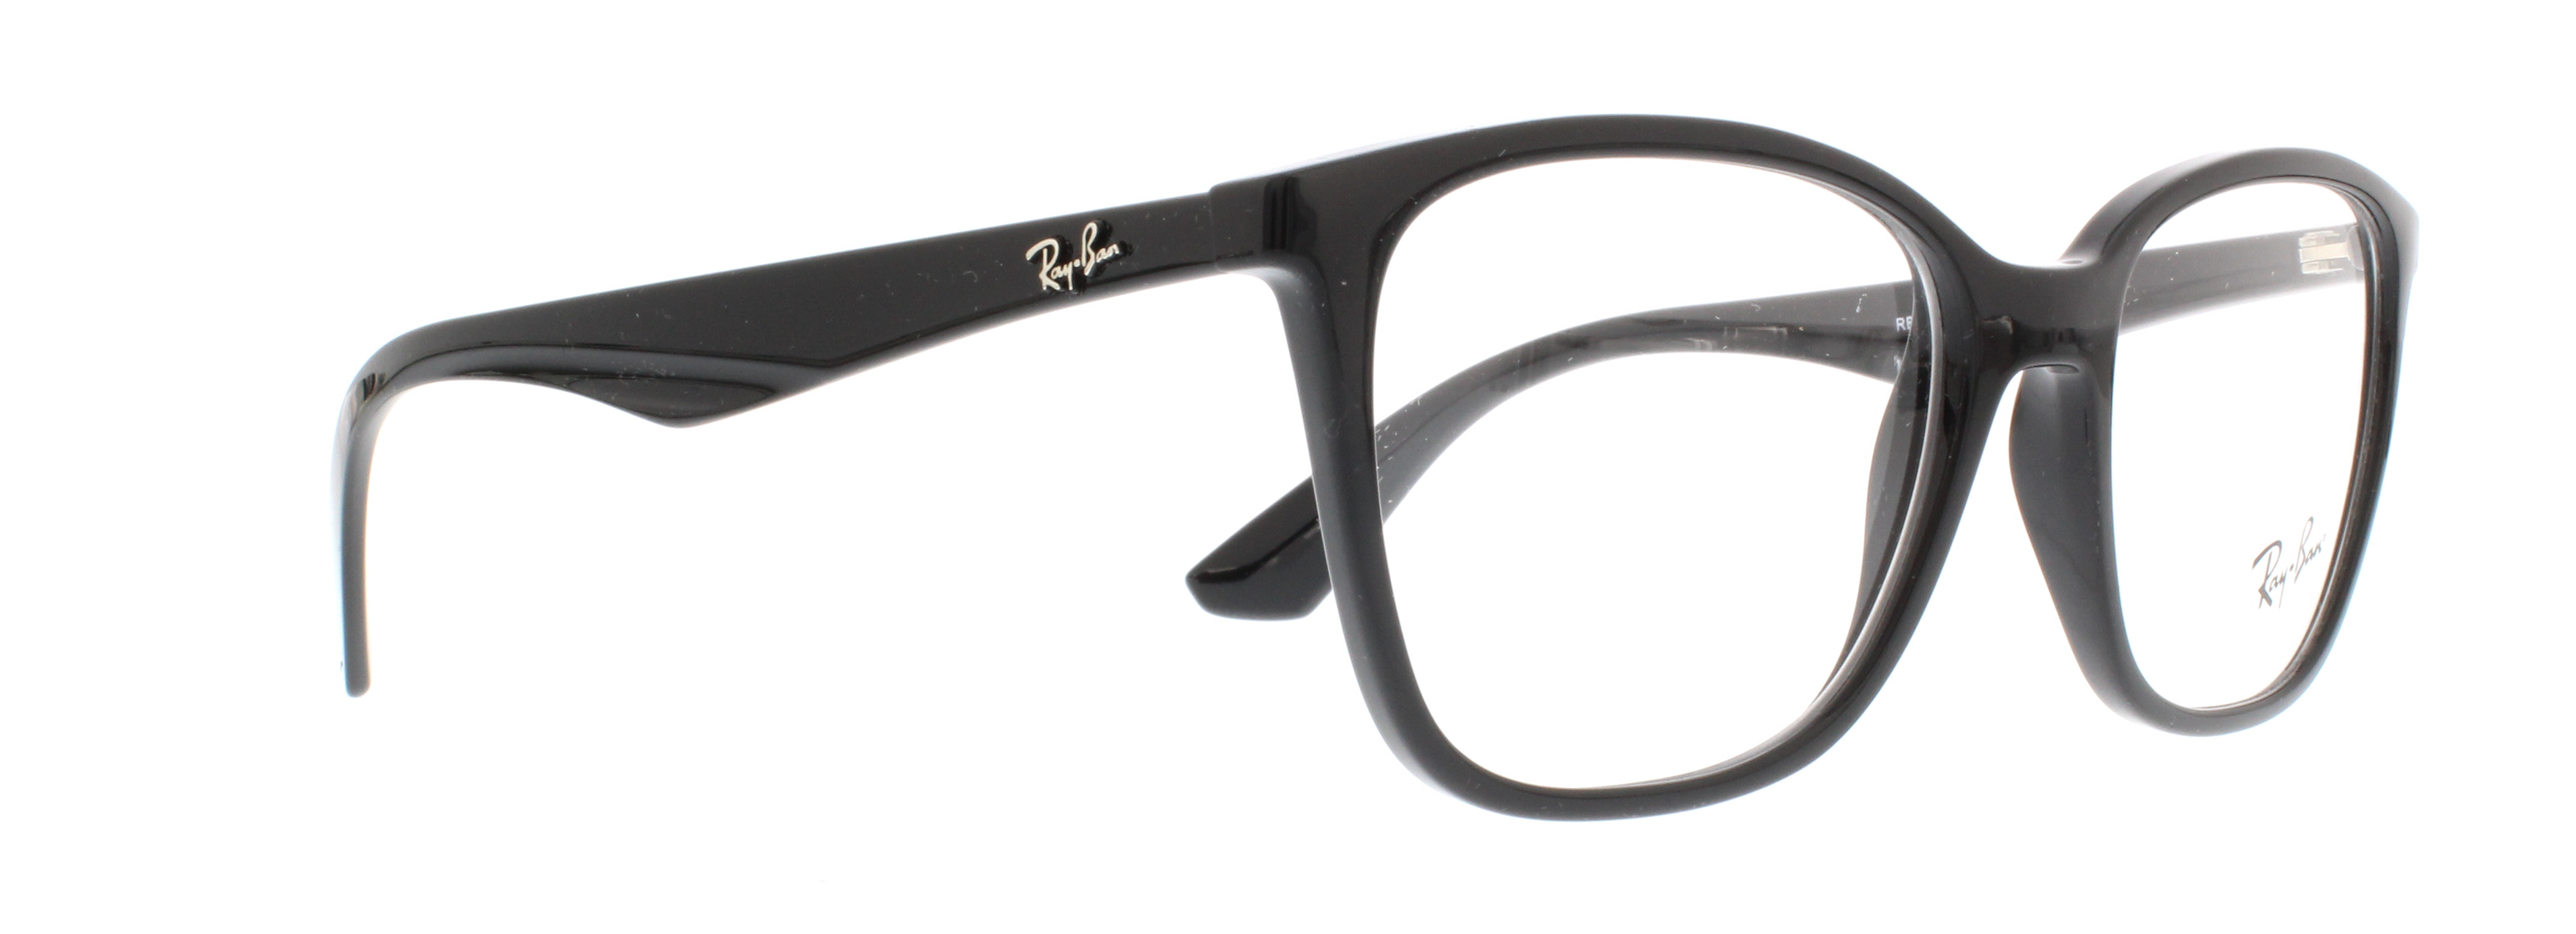 06c5f8bf4eb ... amazon picture of ray ban eyeglasses rx7066 d702f 79b4b